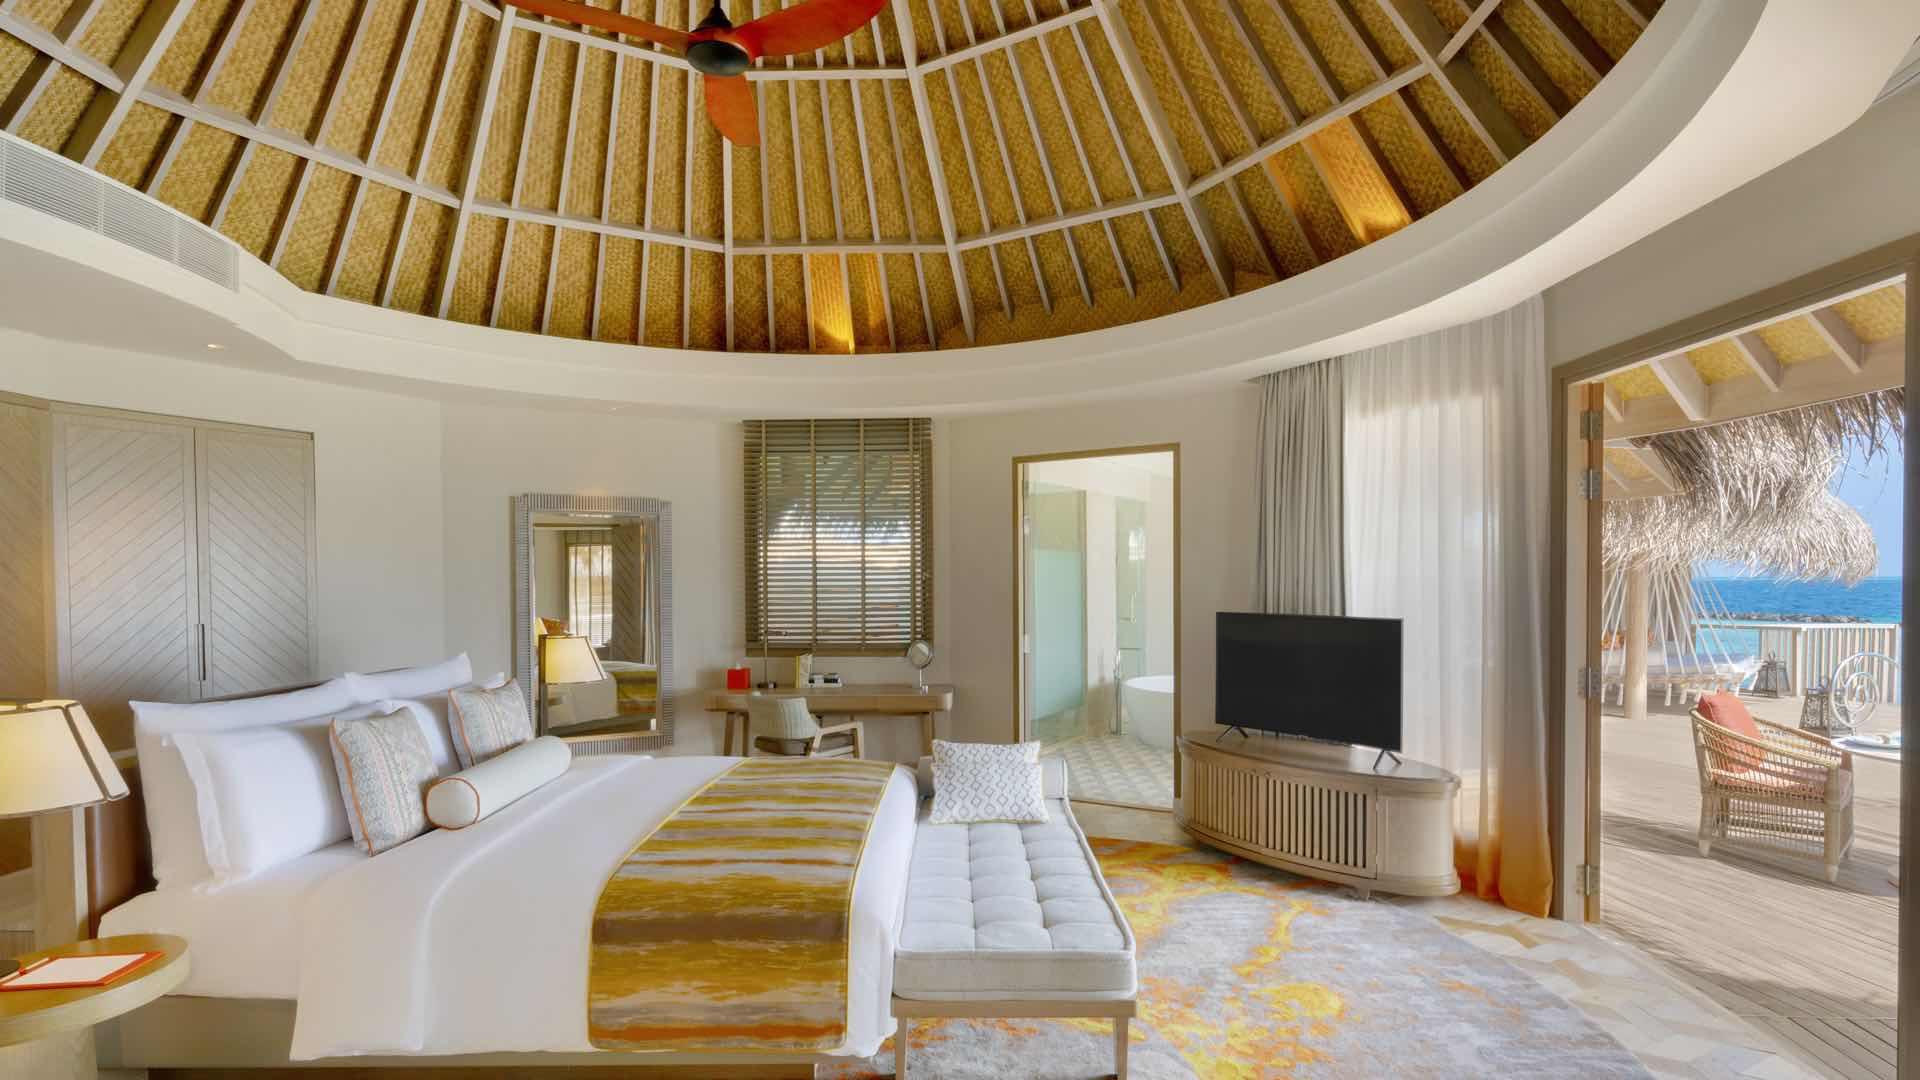 Resort Maldive The Nautilus Maldives Ocean residence